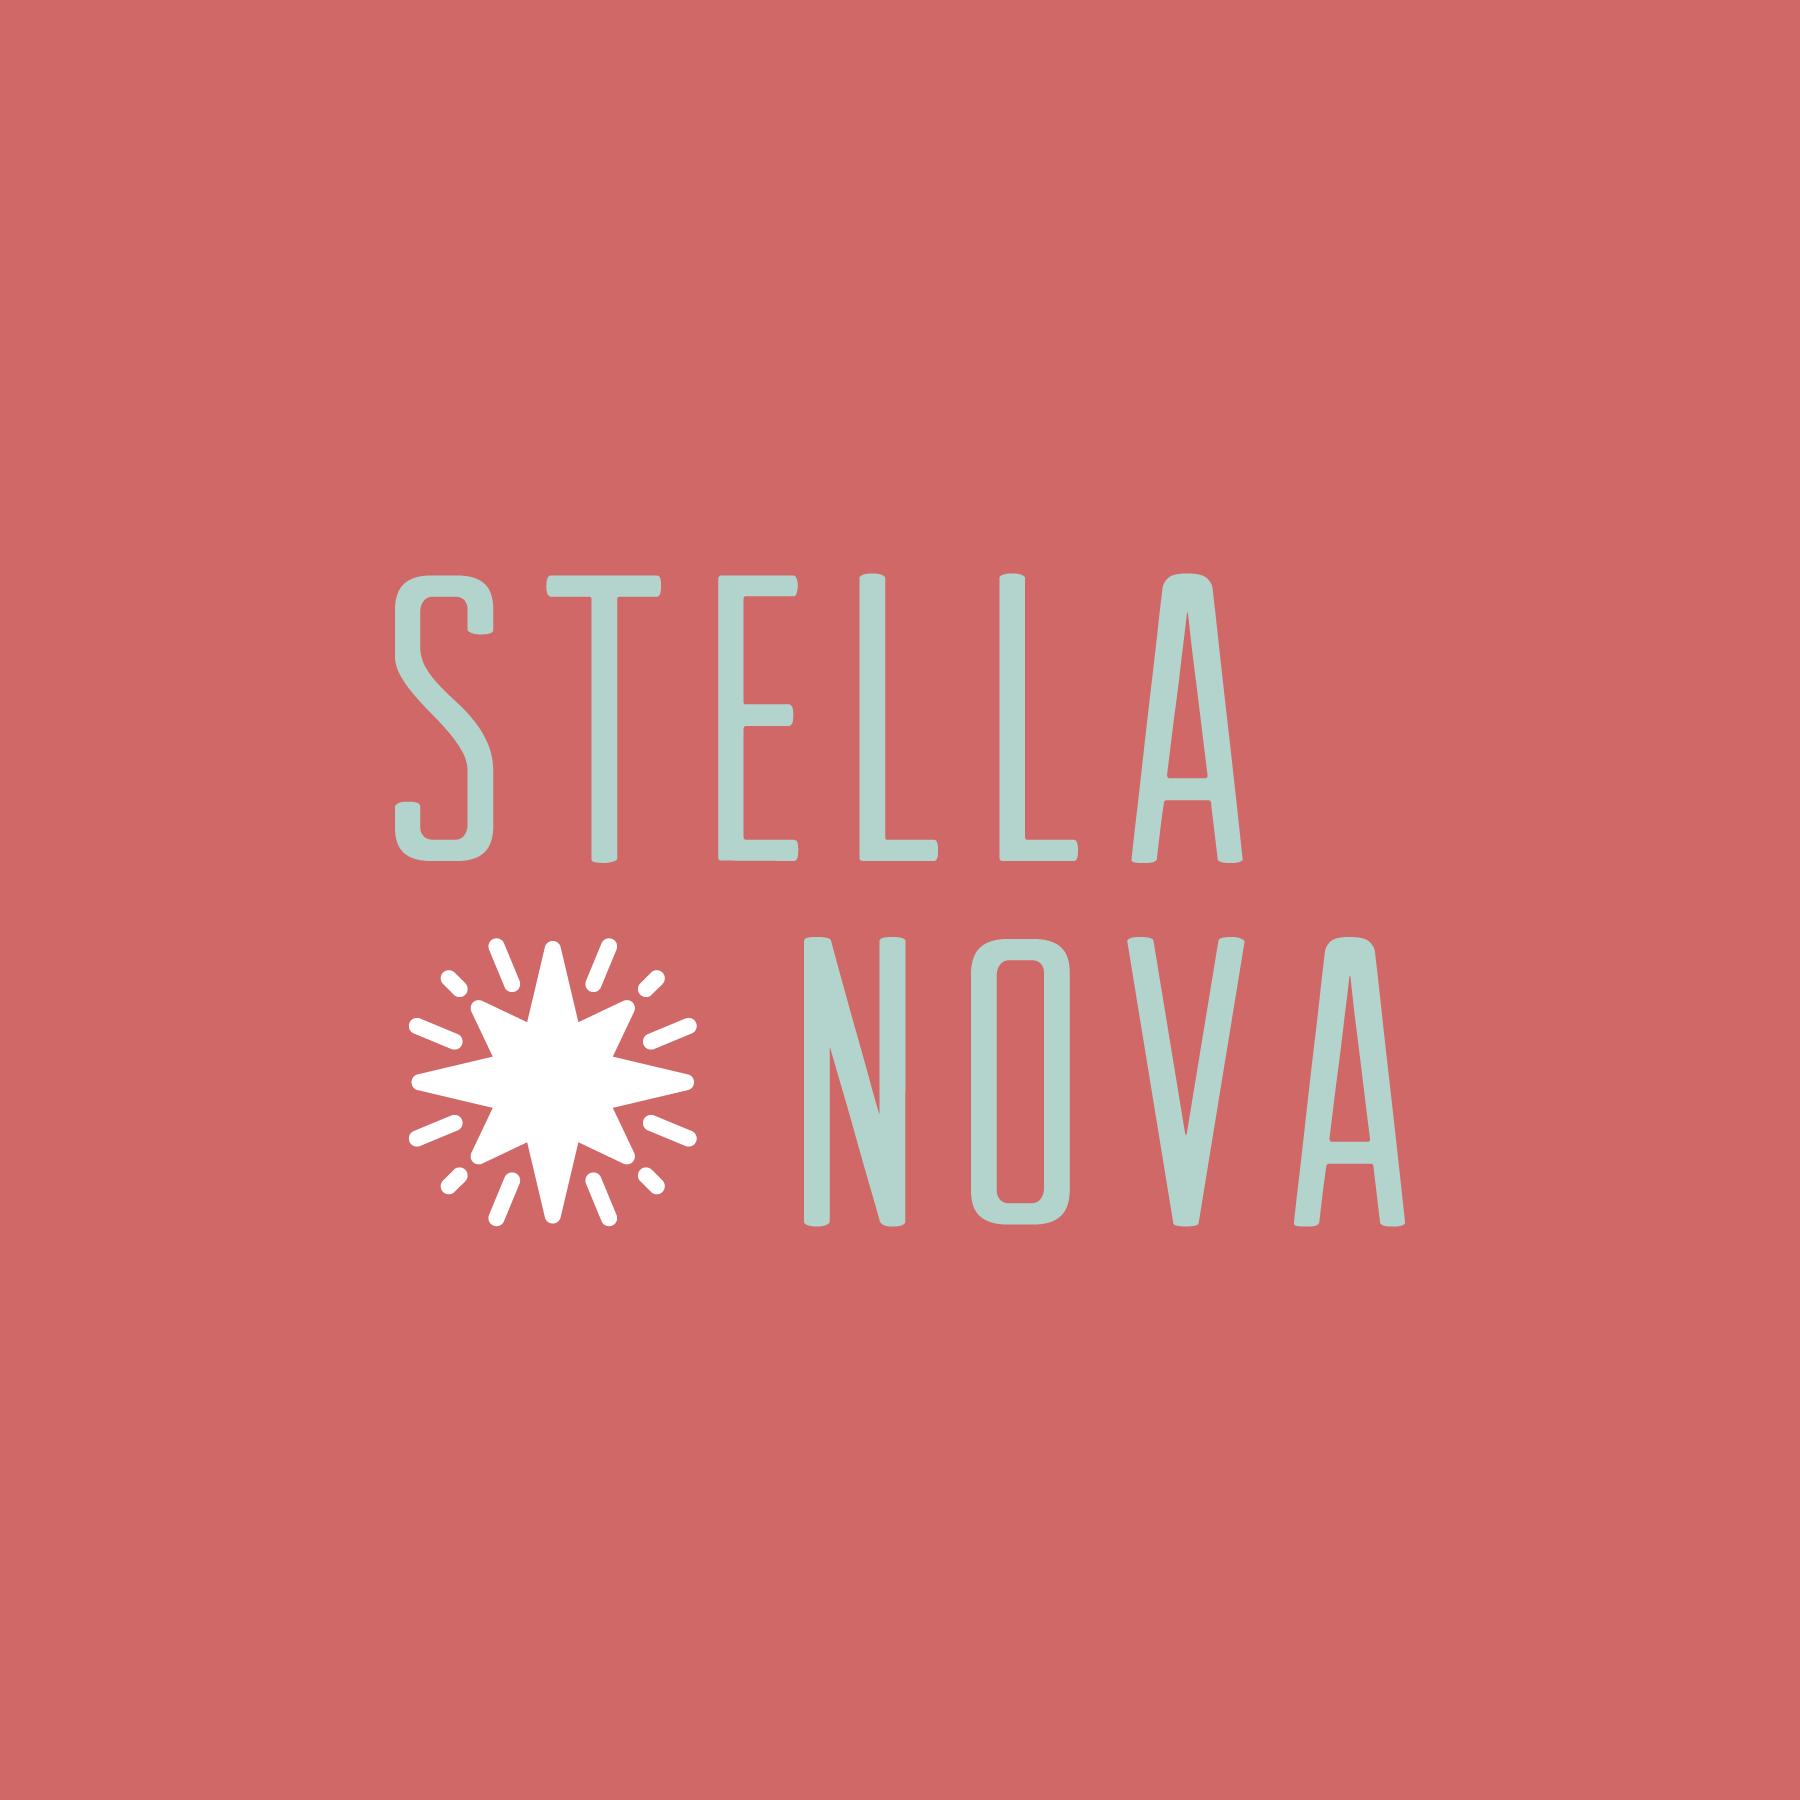 Stella-Nova-02.png